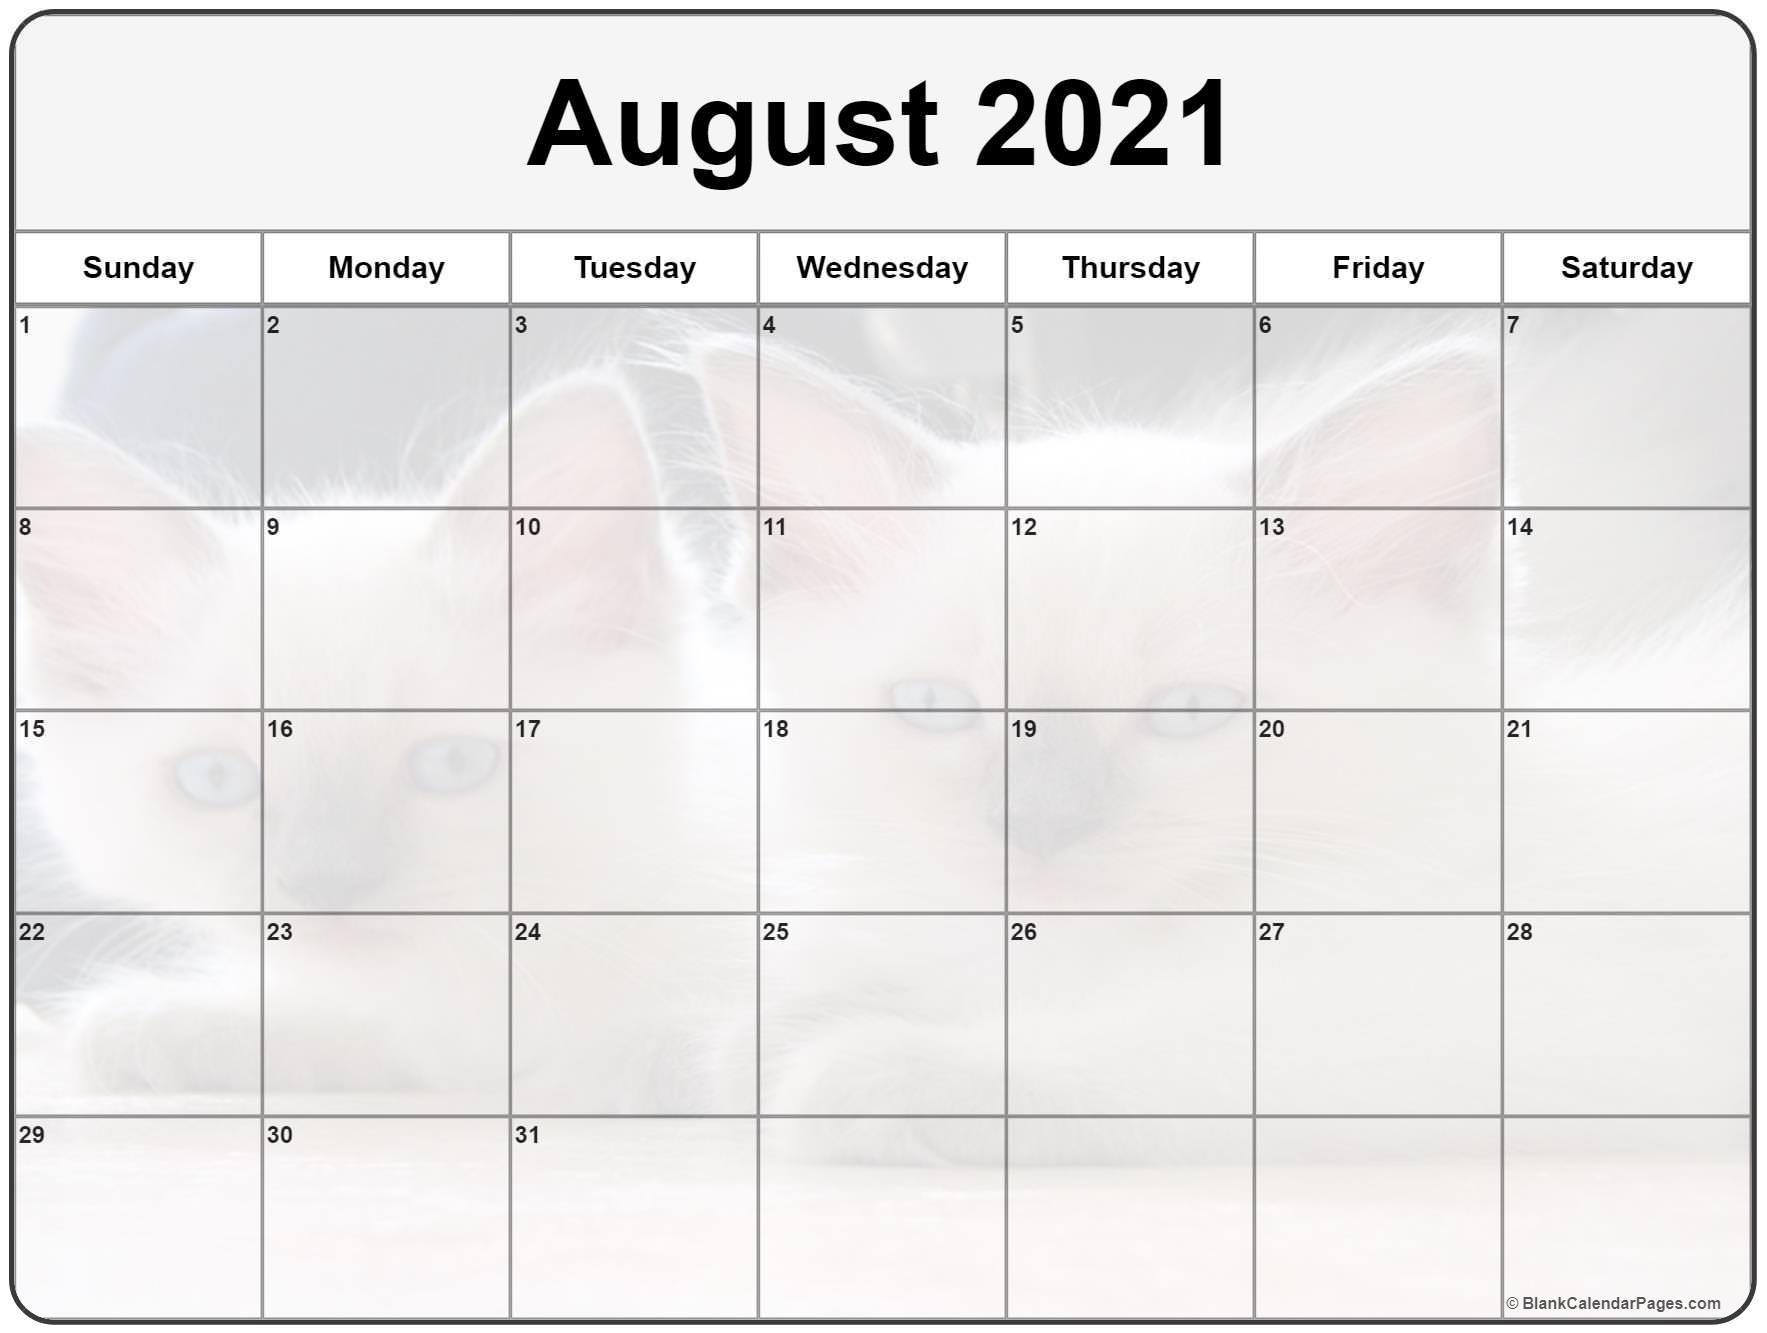 collection of august 2021 photo calendars simple::Cute Agust 2021 Calendar